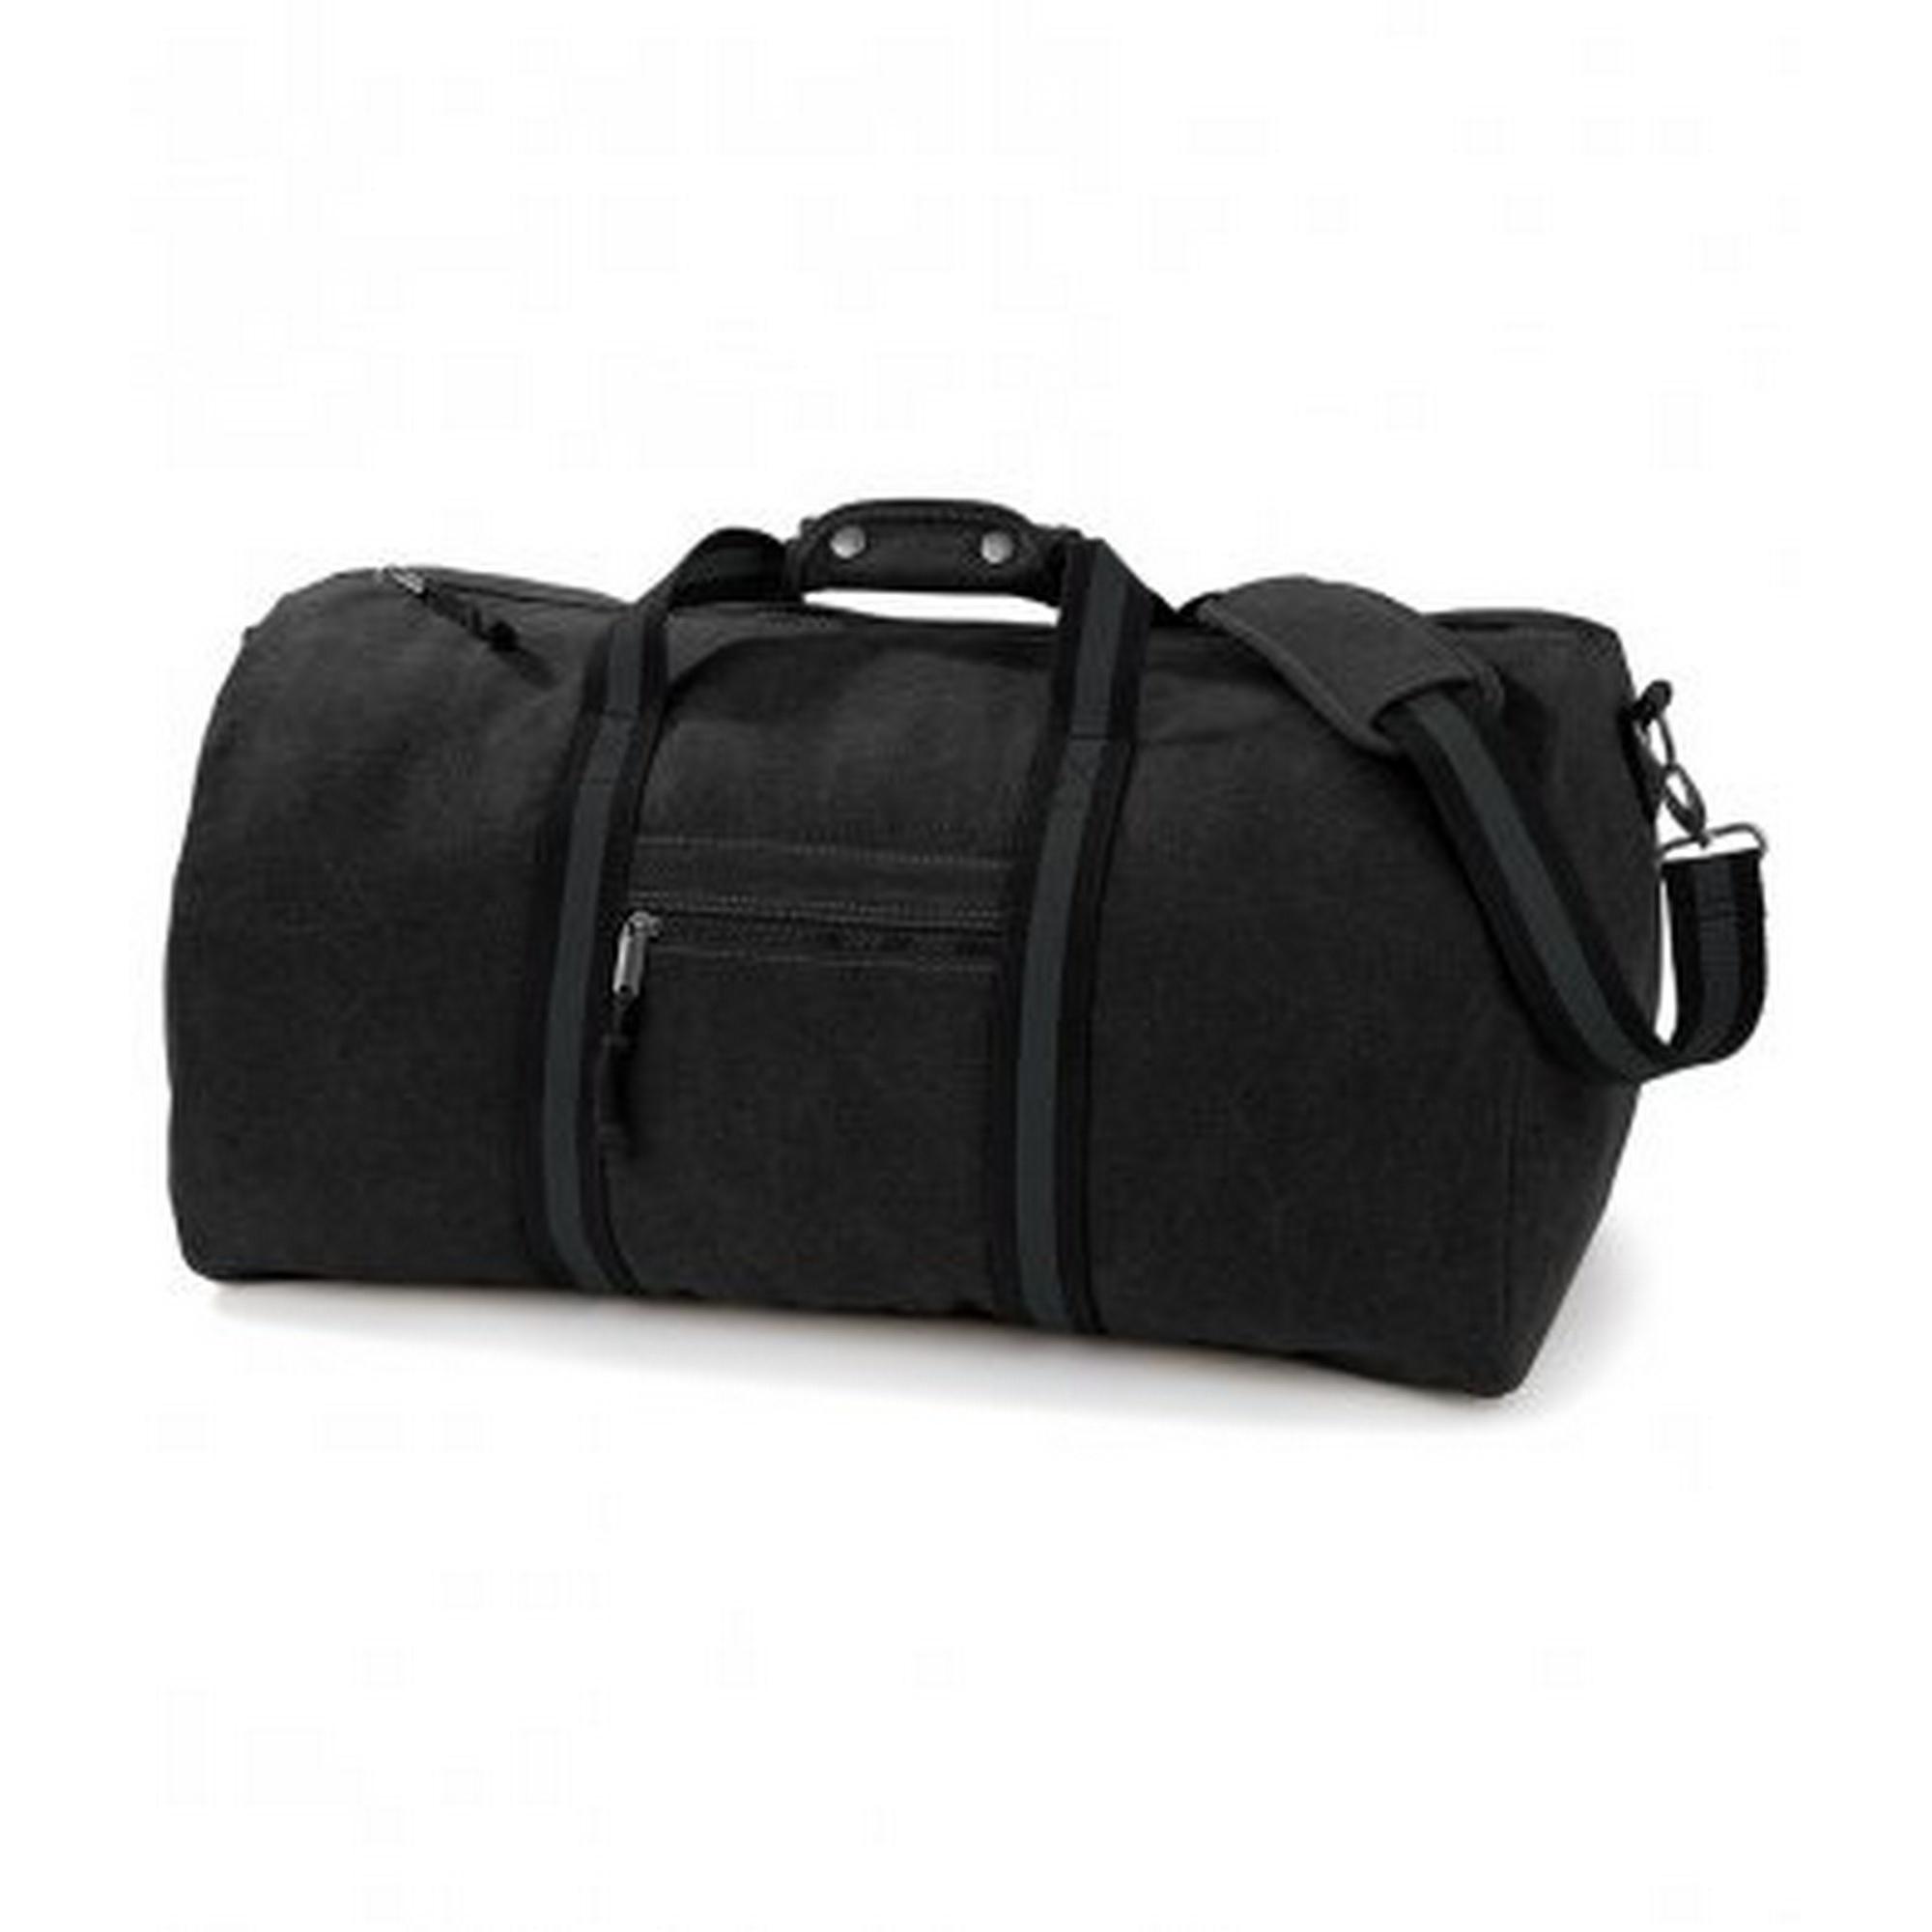 Quadra Vintage Canvas Holdall Duffle Bag - 45 Litres (One Size) (Vintage Black)